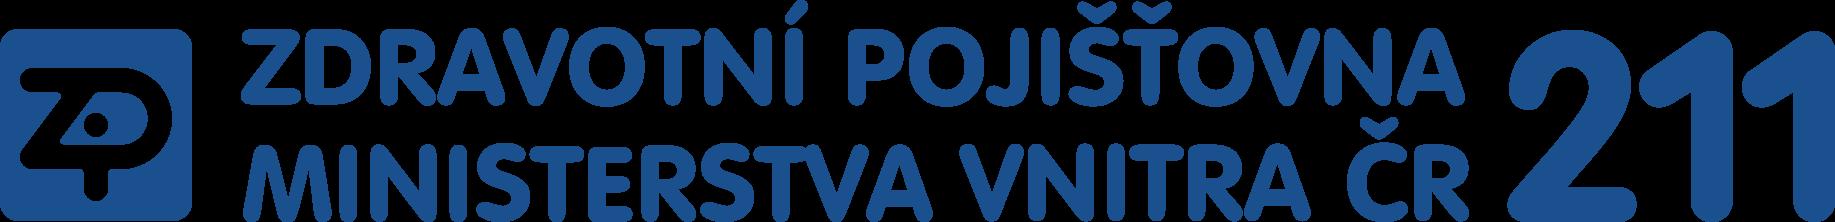 2a.logotyp_horizontalni_doplnkova